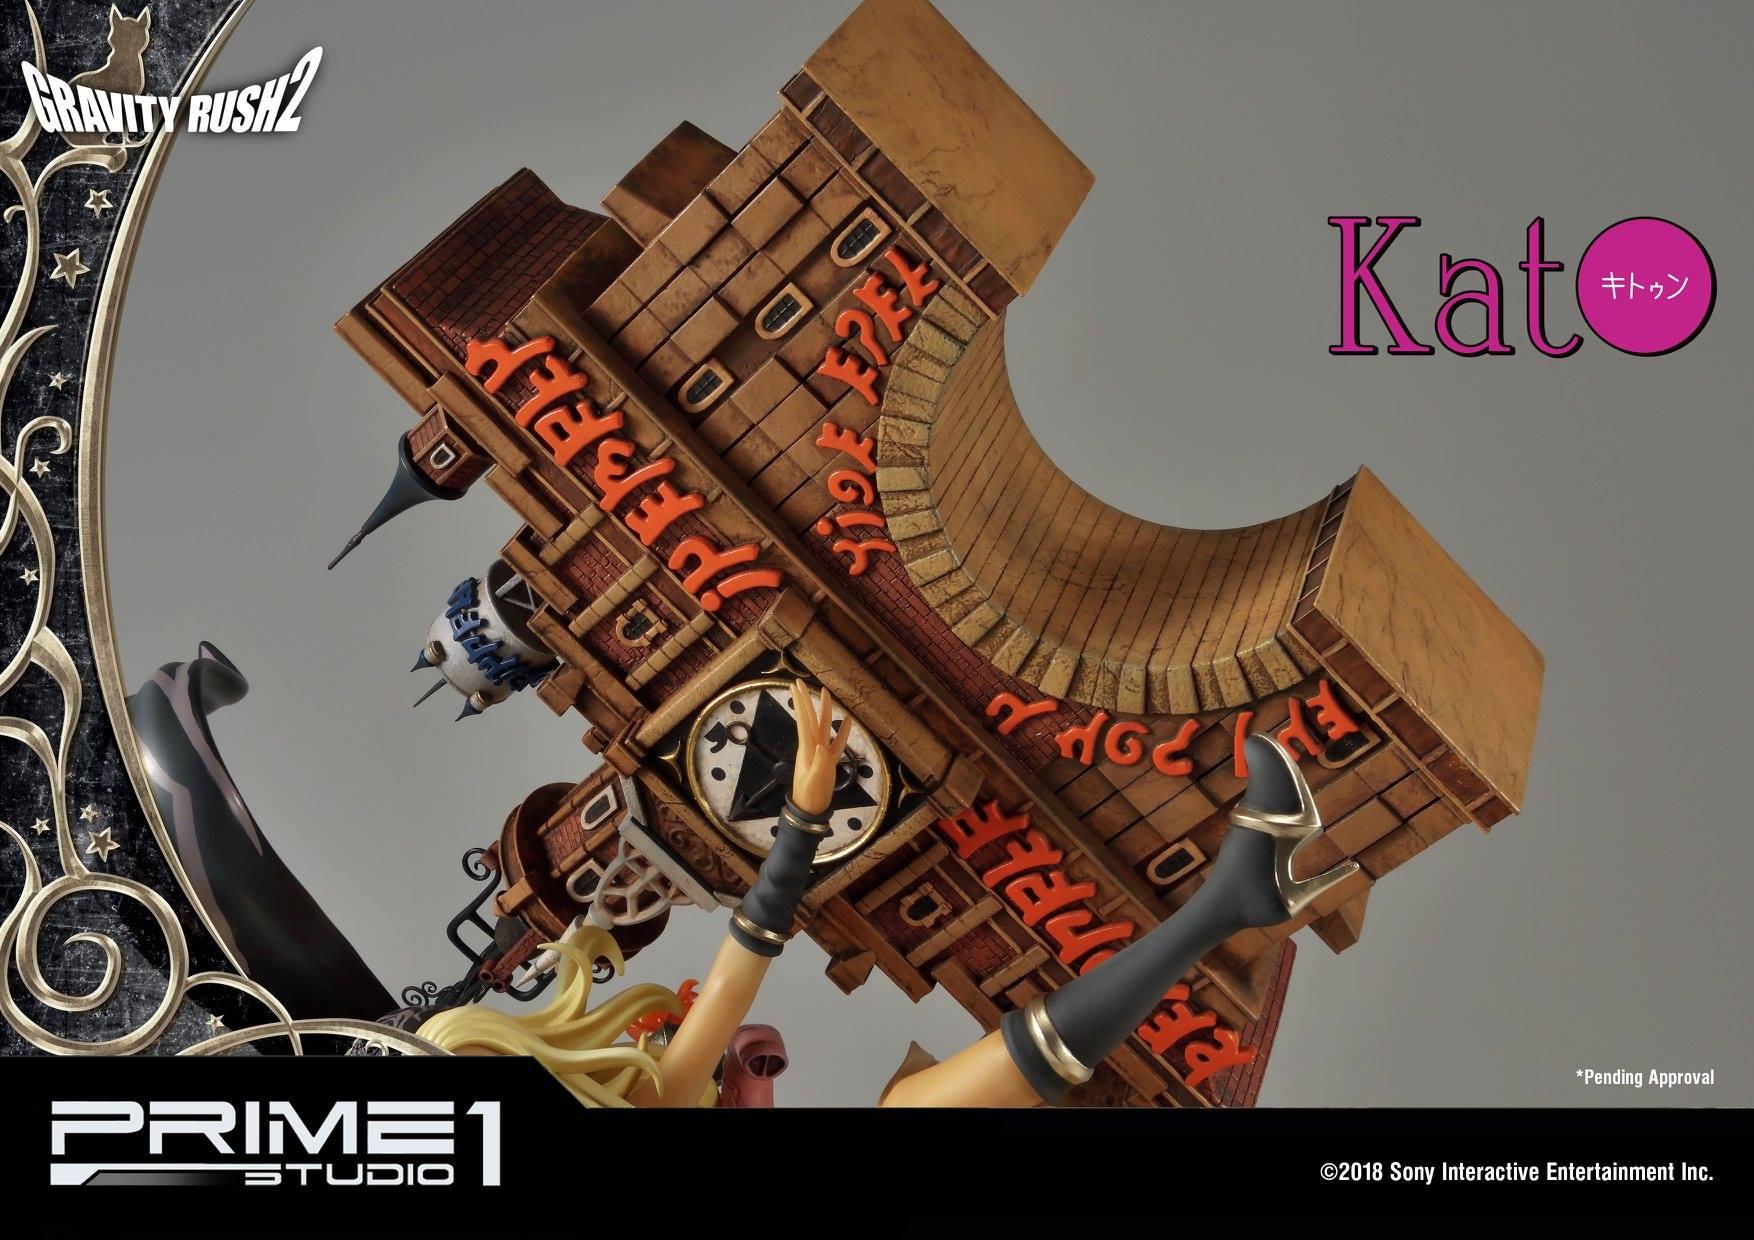 Prime_1_Studio_Kat_Prototype_CMGR2-01_40